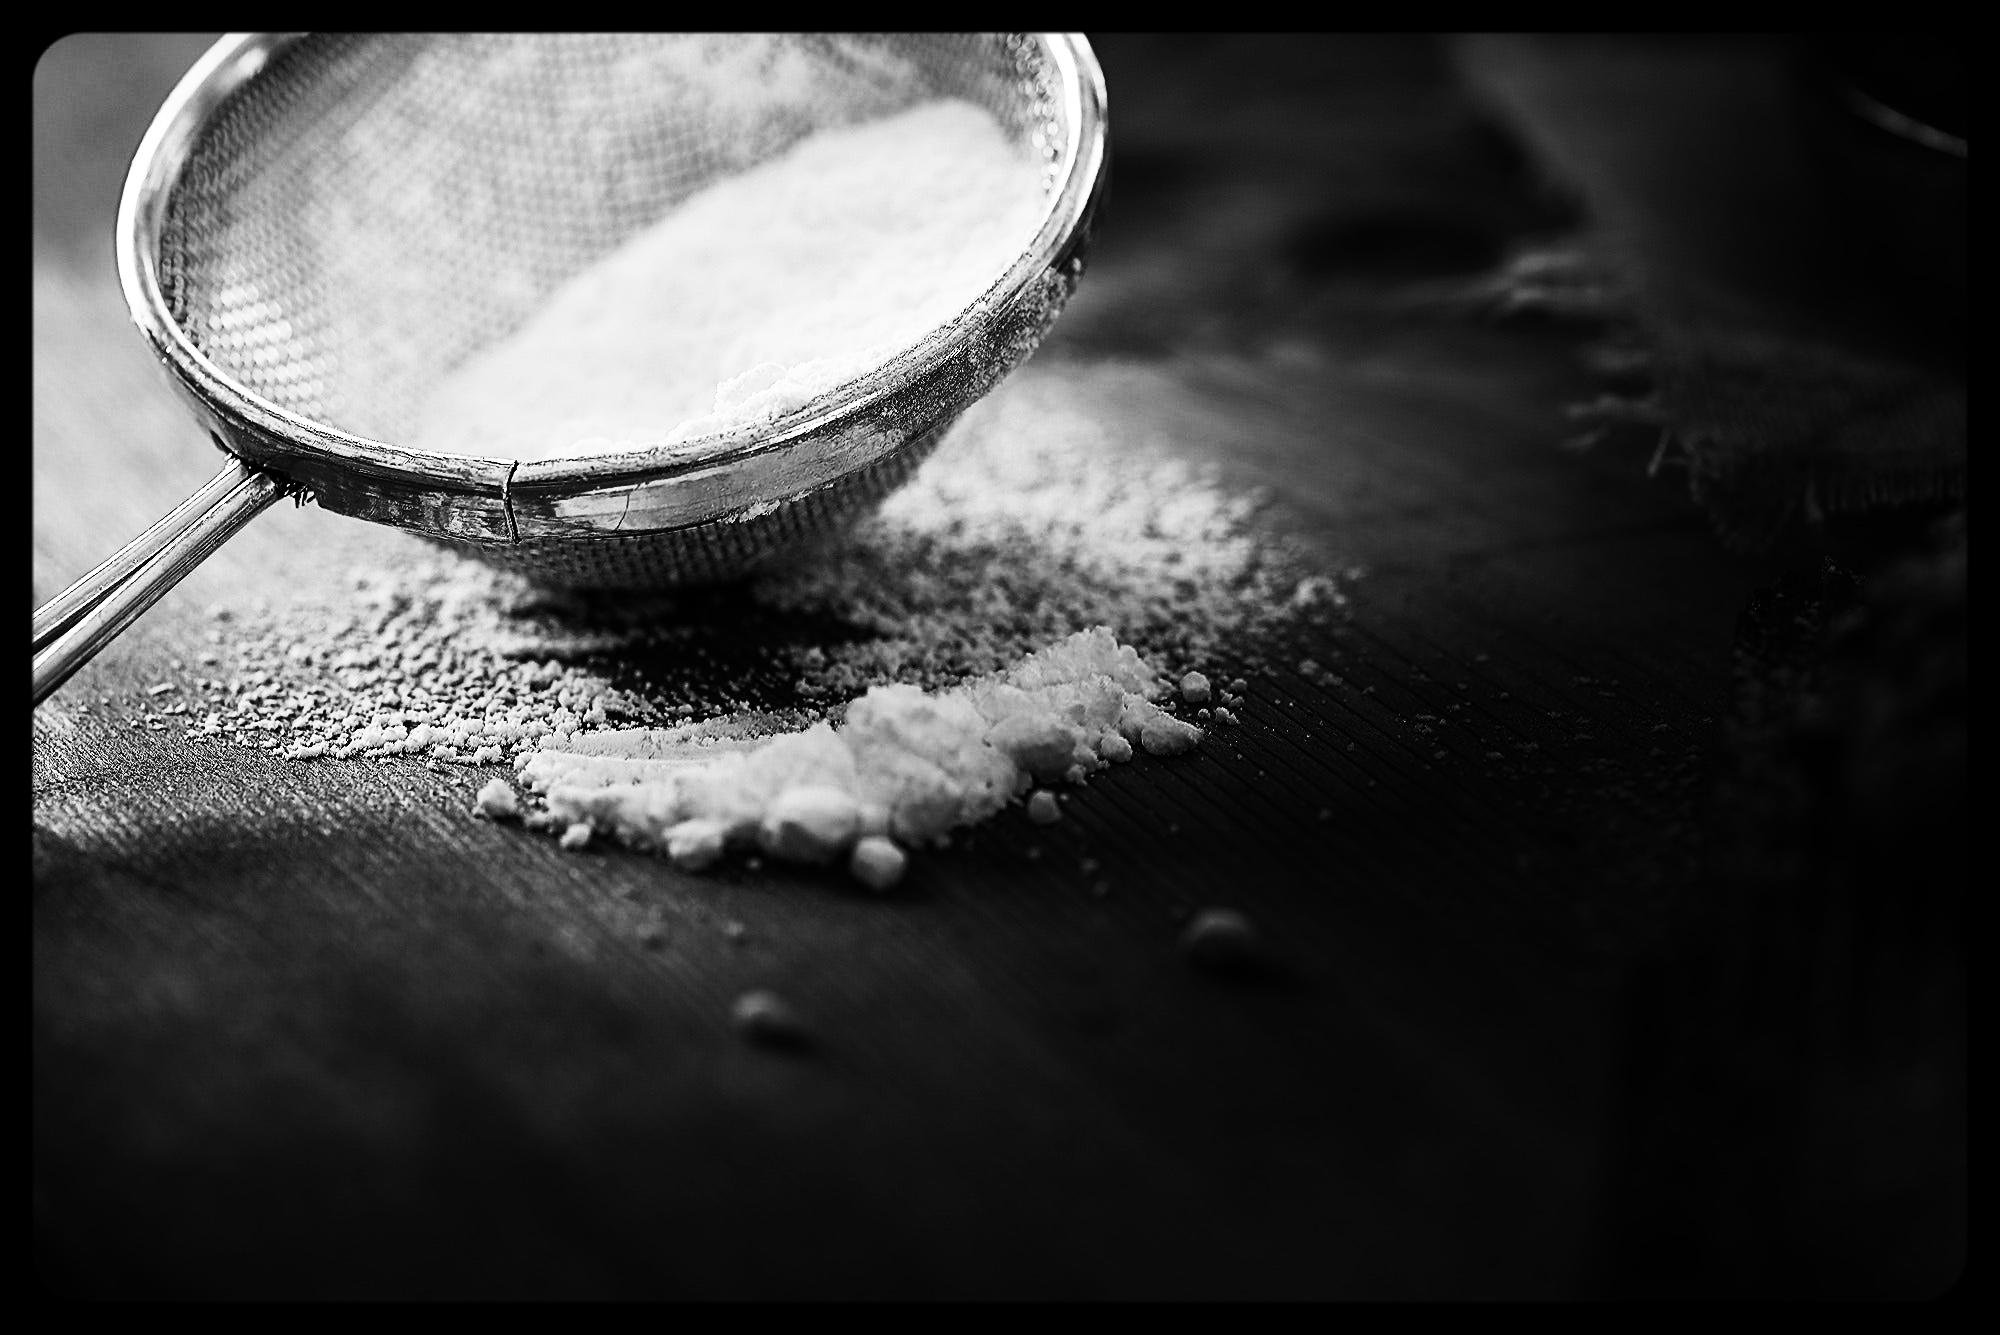 bakery-baking-blur-271082.jpg